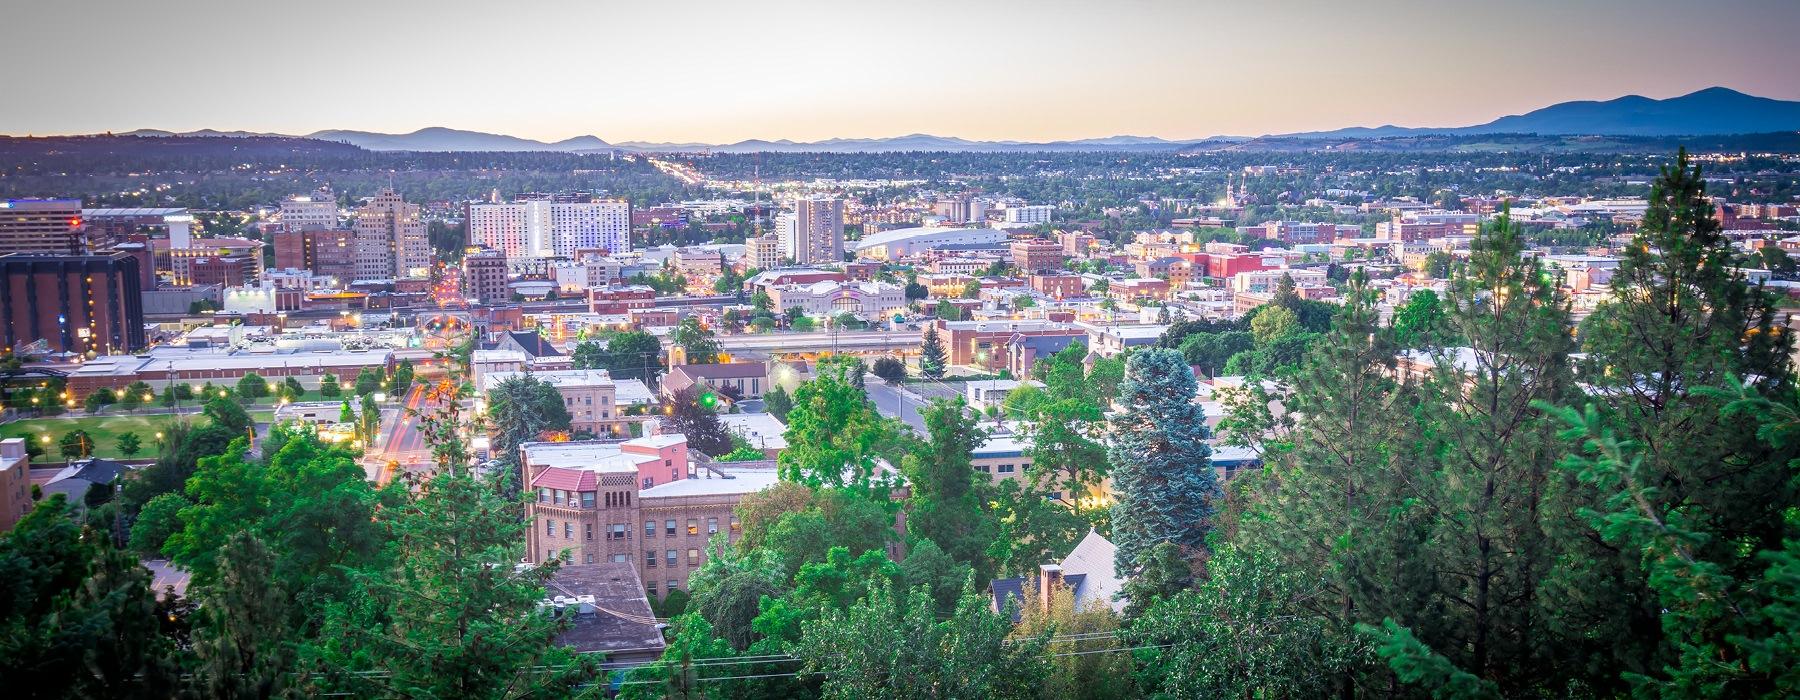 Spokane City Skyline